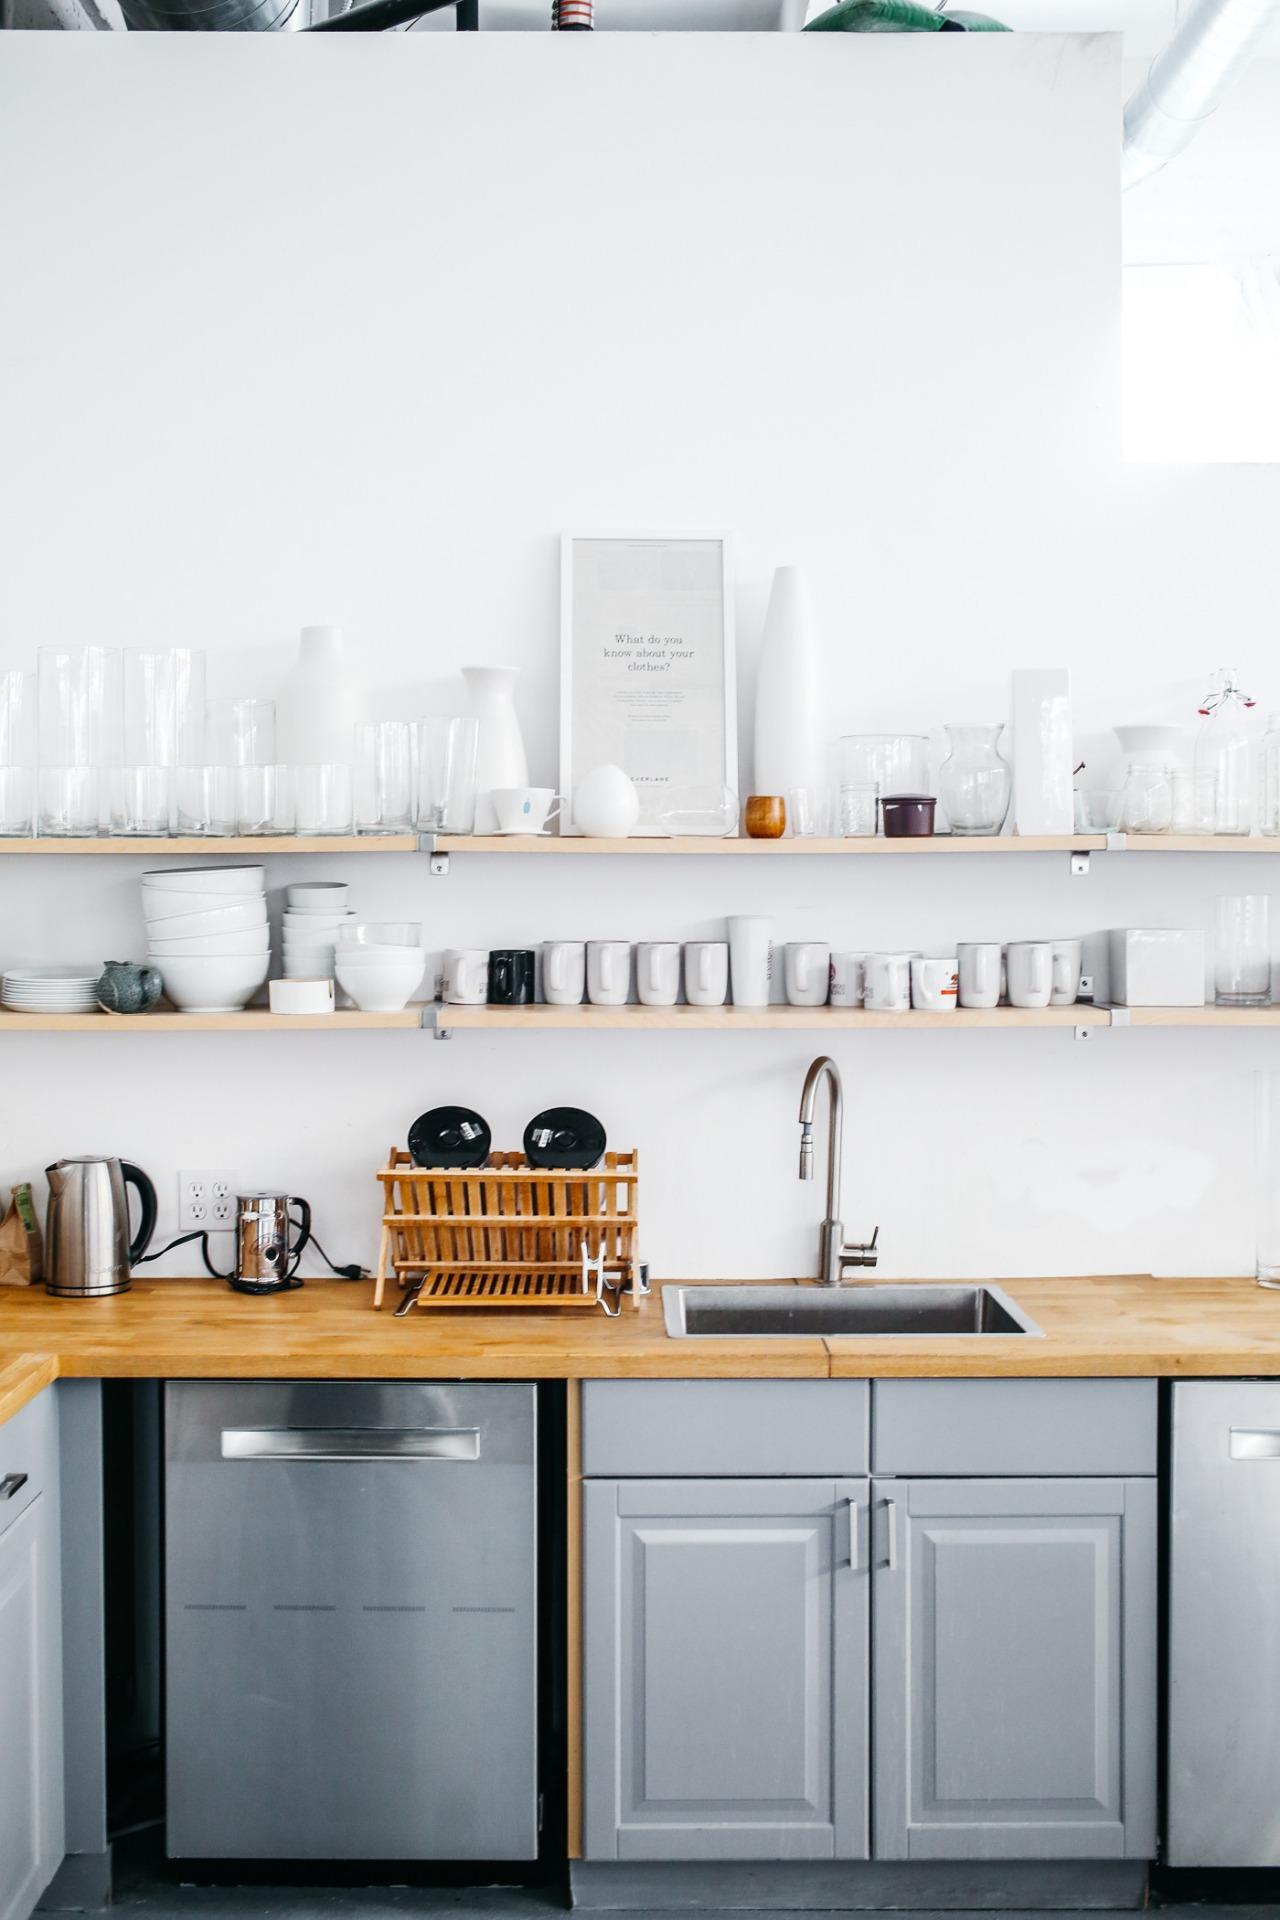 kitchen interior Tumblr Collection #14